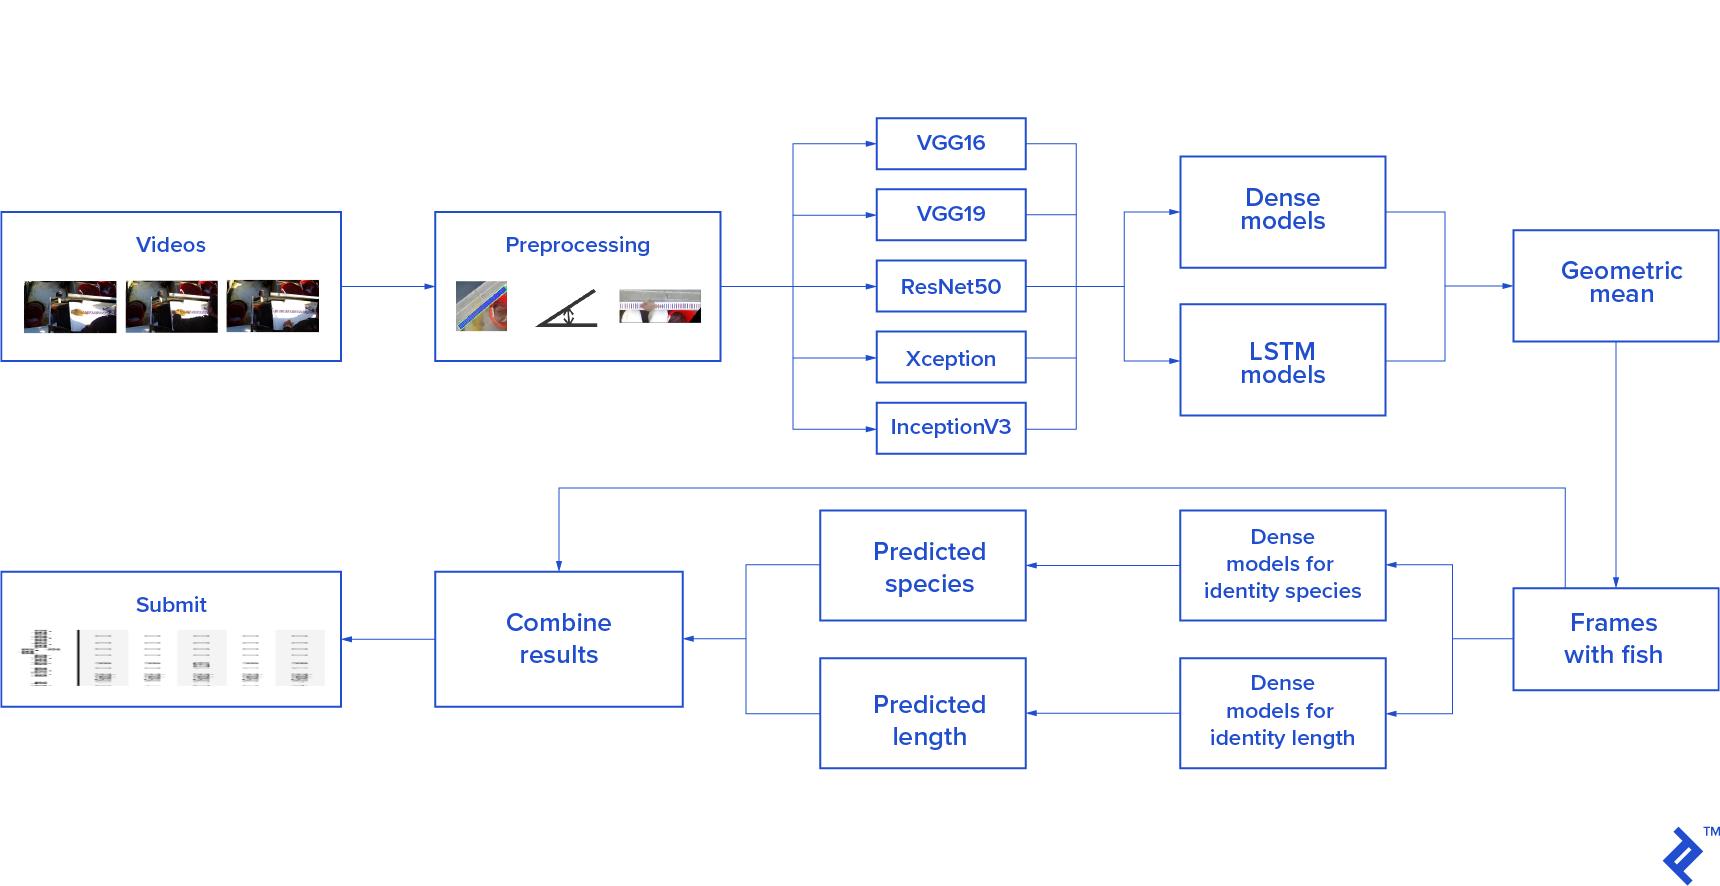 flowchart depicting the complete scheme